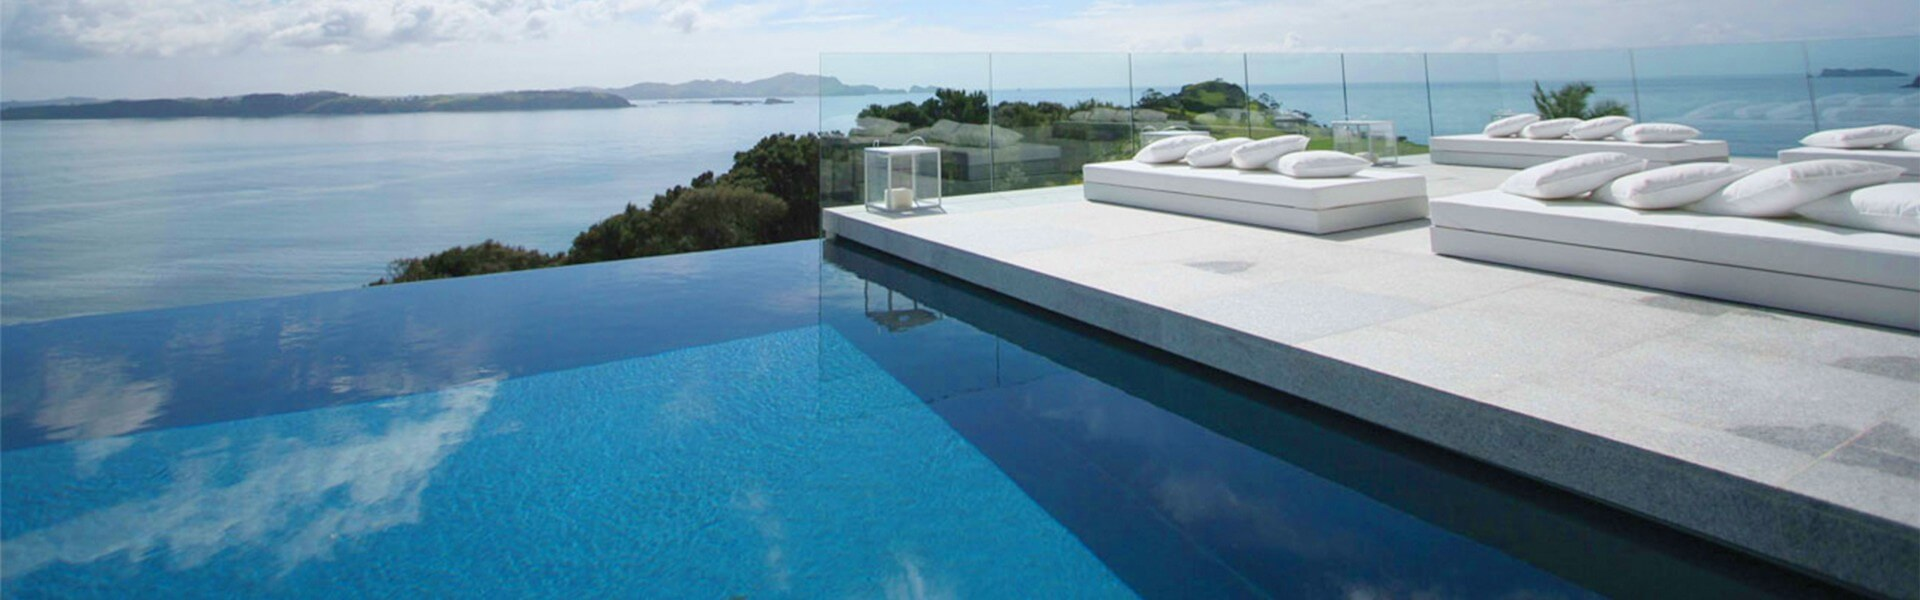 Swimmingpool  Home - Swimmingpool